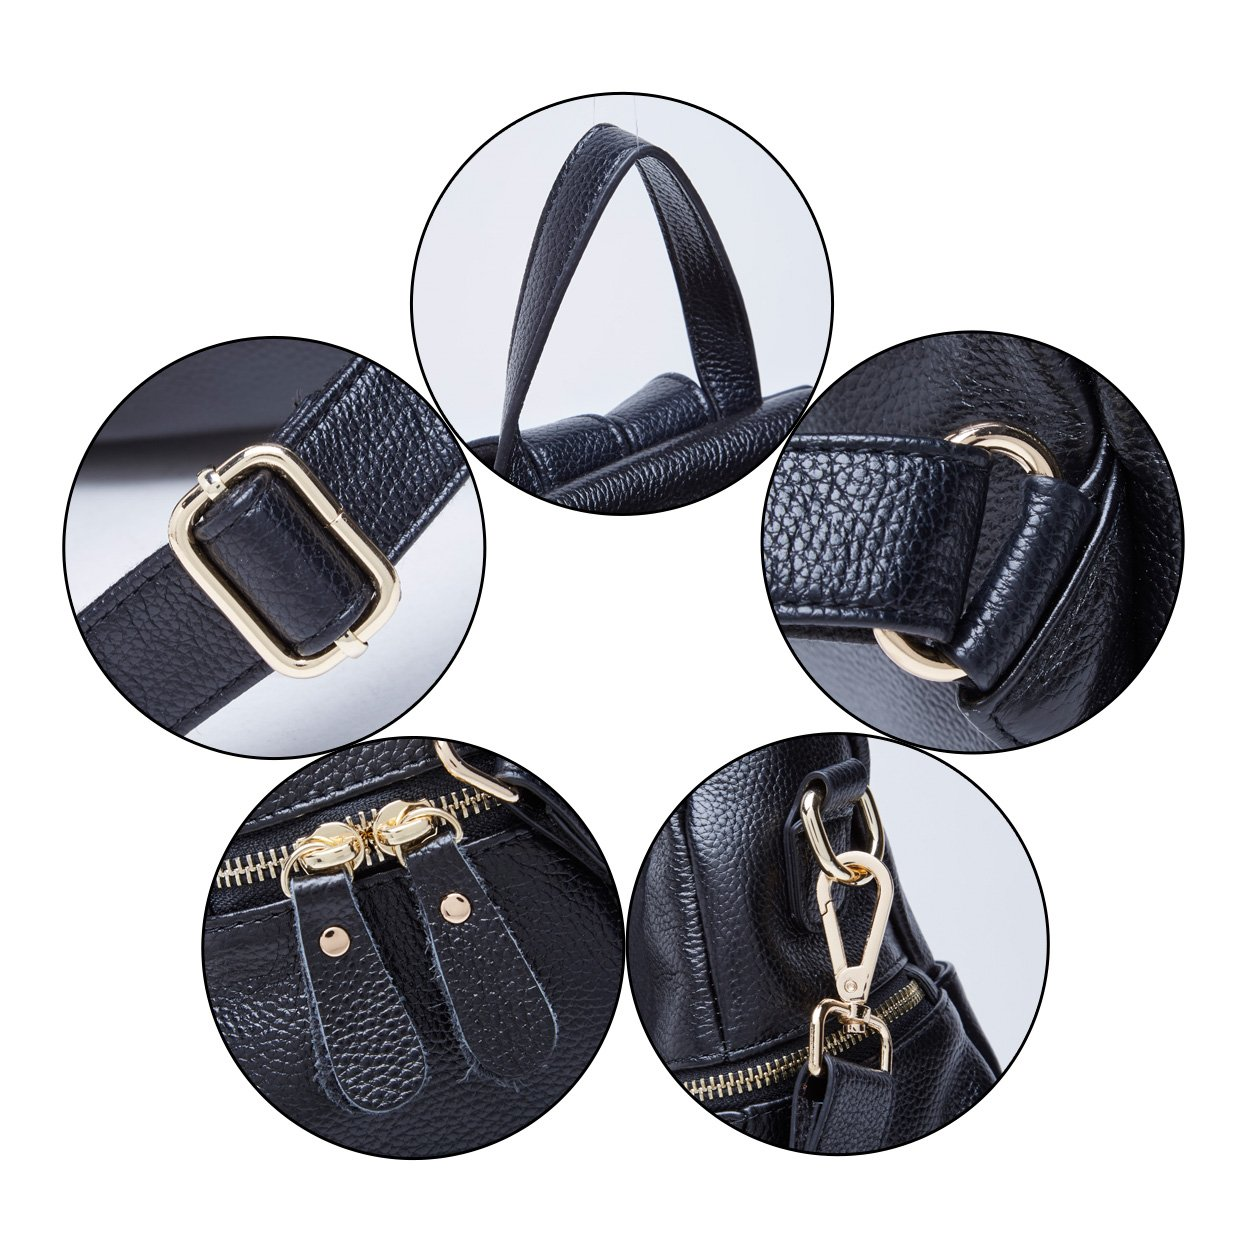 BOYATU Convertible Genuine Leather Backpack Purse for Women Fashion Travel Bag (Black) by BOYATU (Image #6)